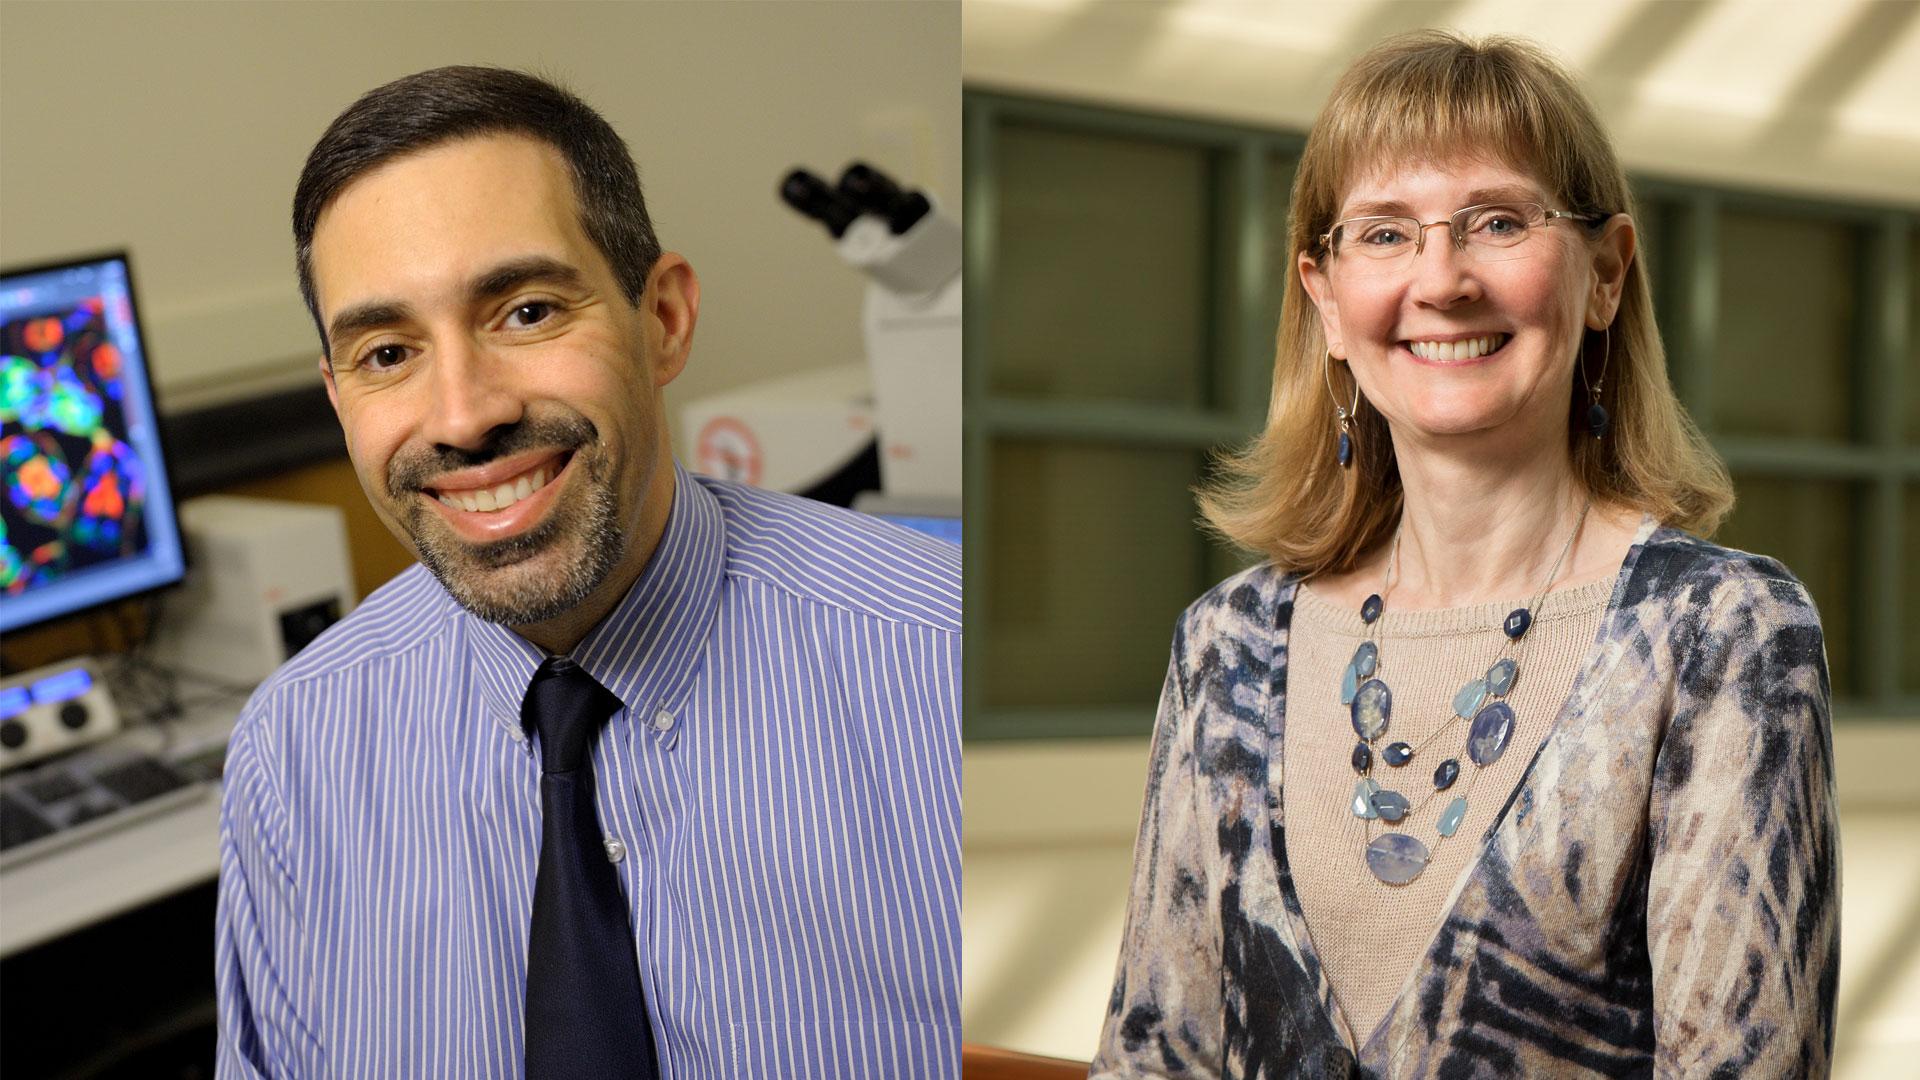 Dan Llano and Susan Schantz side-by-side